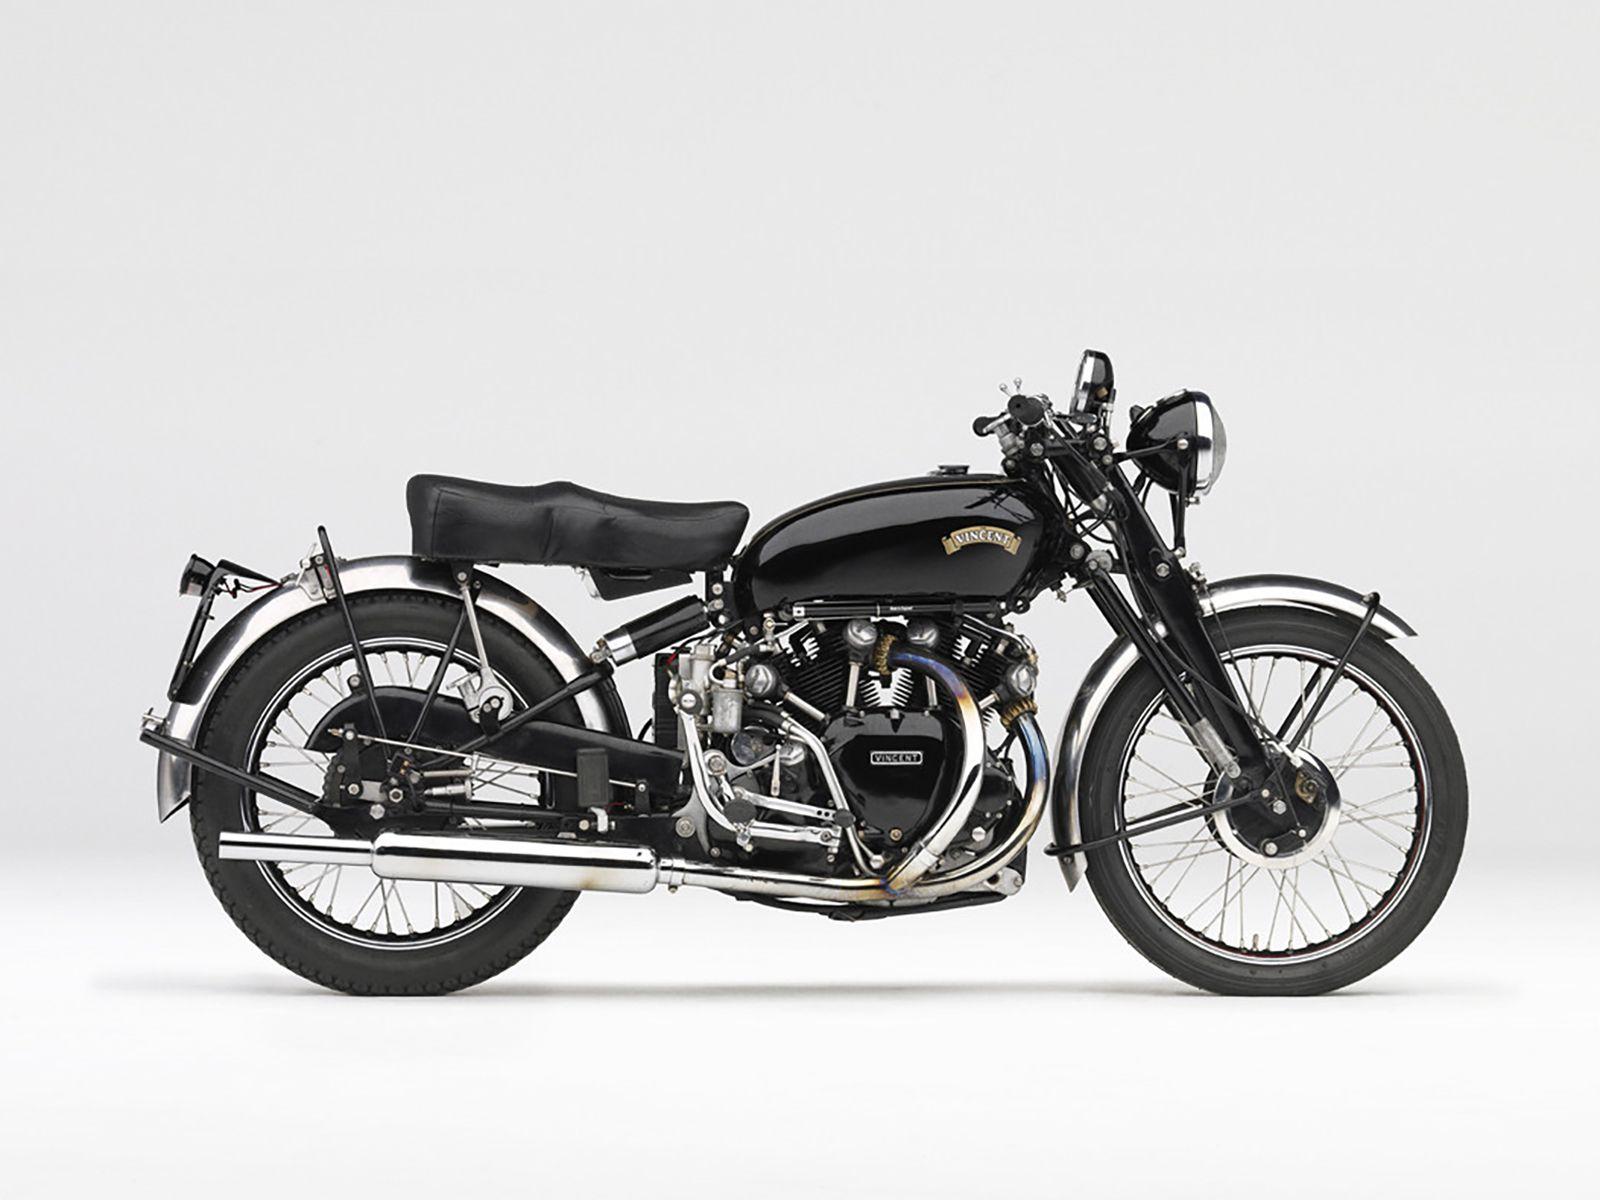 photos de moto vintage moto scooter motos d 39 occasion. Black Bedroom Furniture Sets. Home Design Ideas